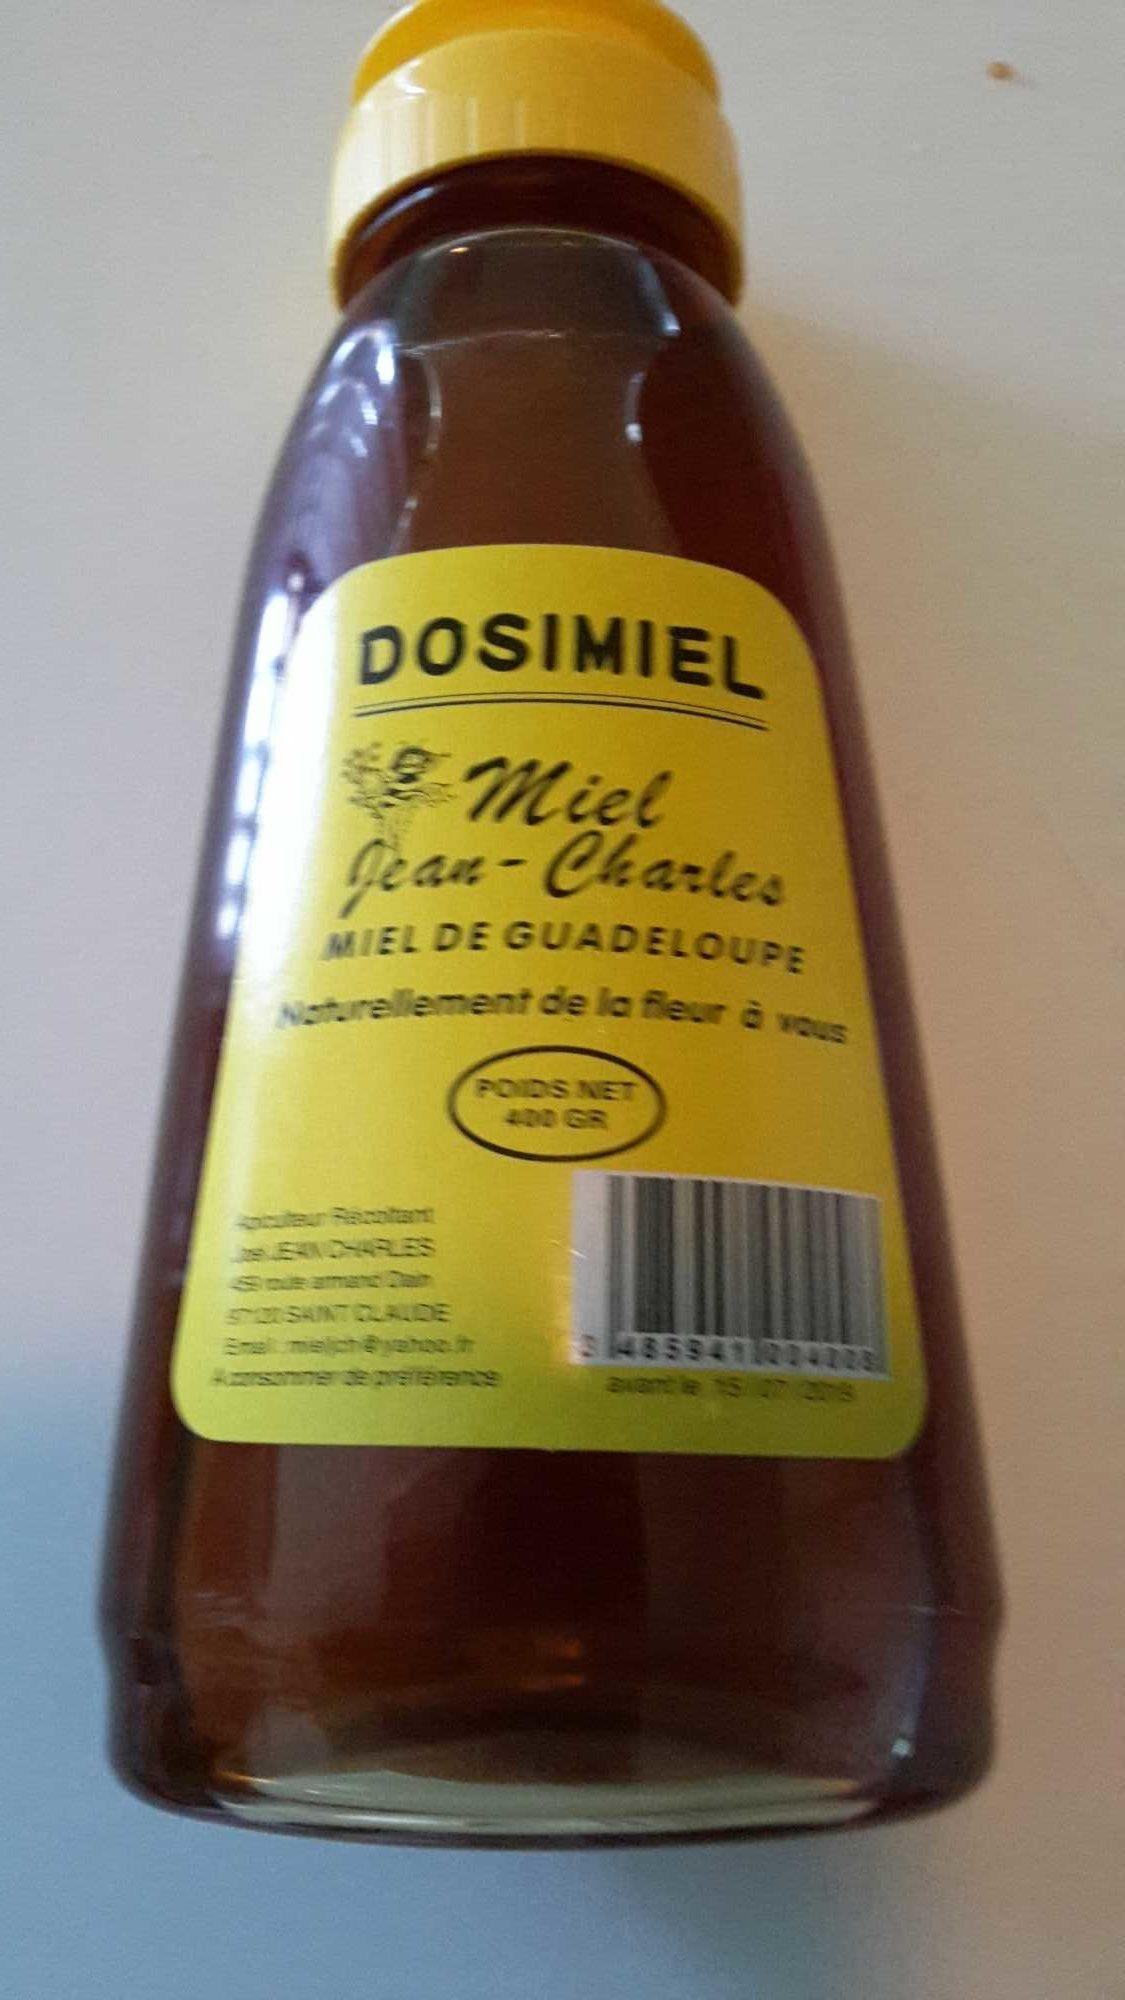 Miel de Guadeloupe - Product